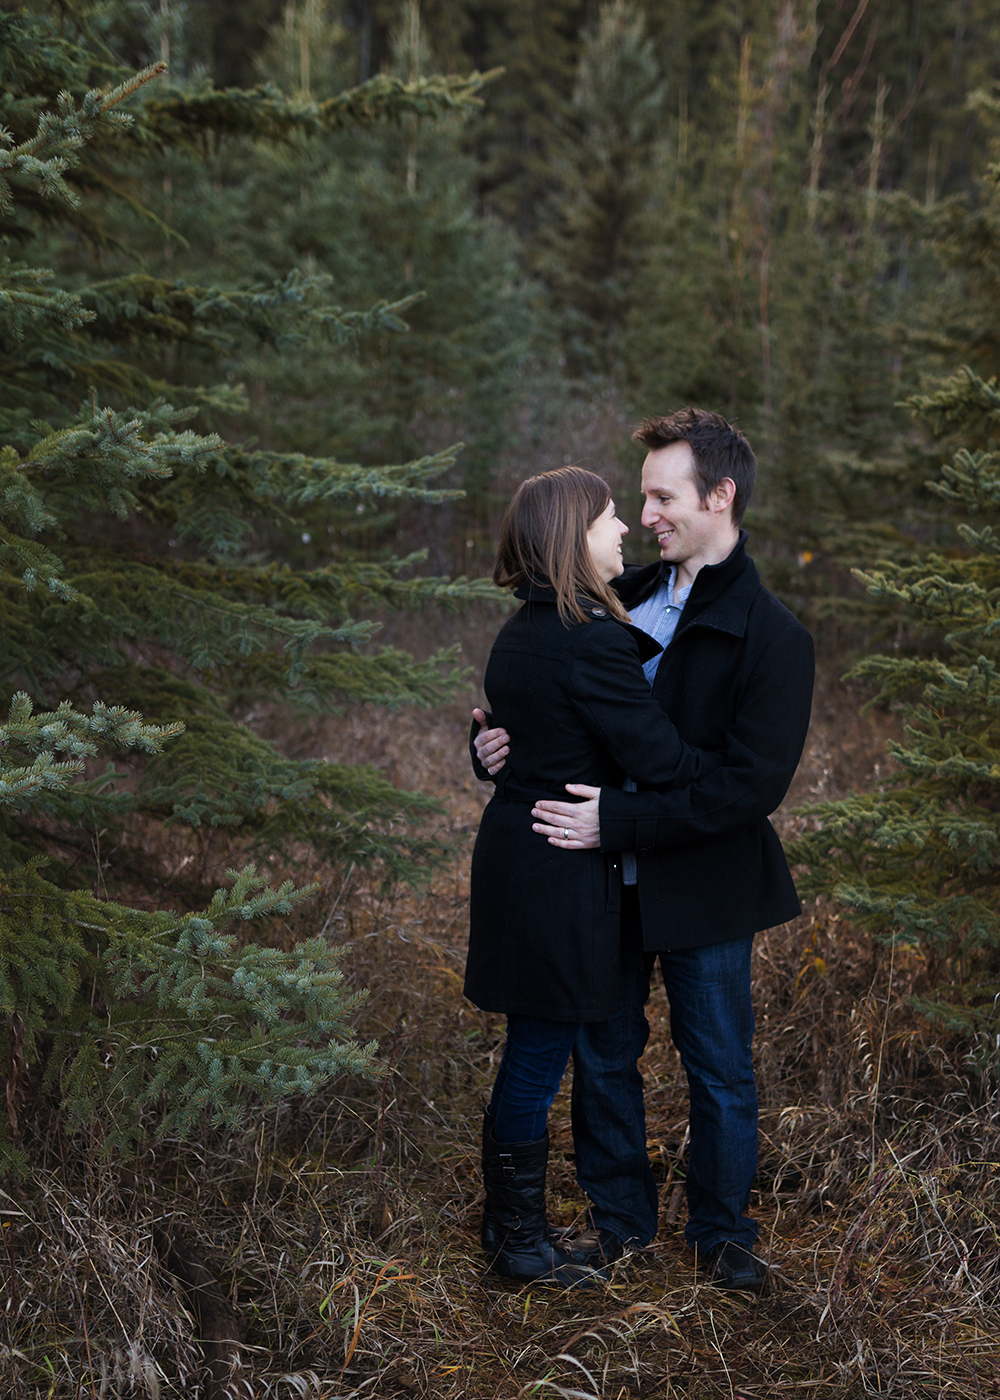 Edmonton Family Photographer_Blinzer Sneak Peek 8.jpg